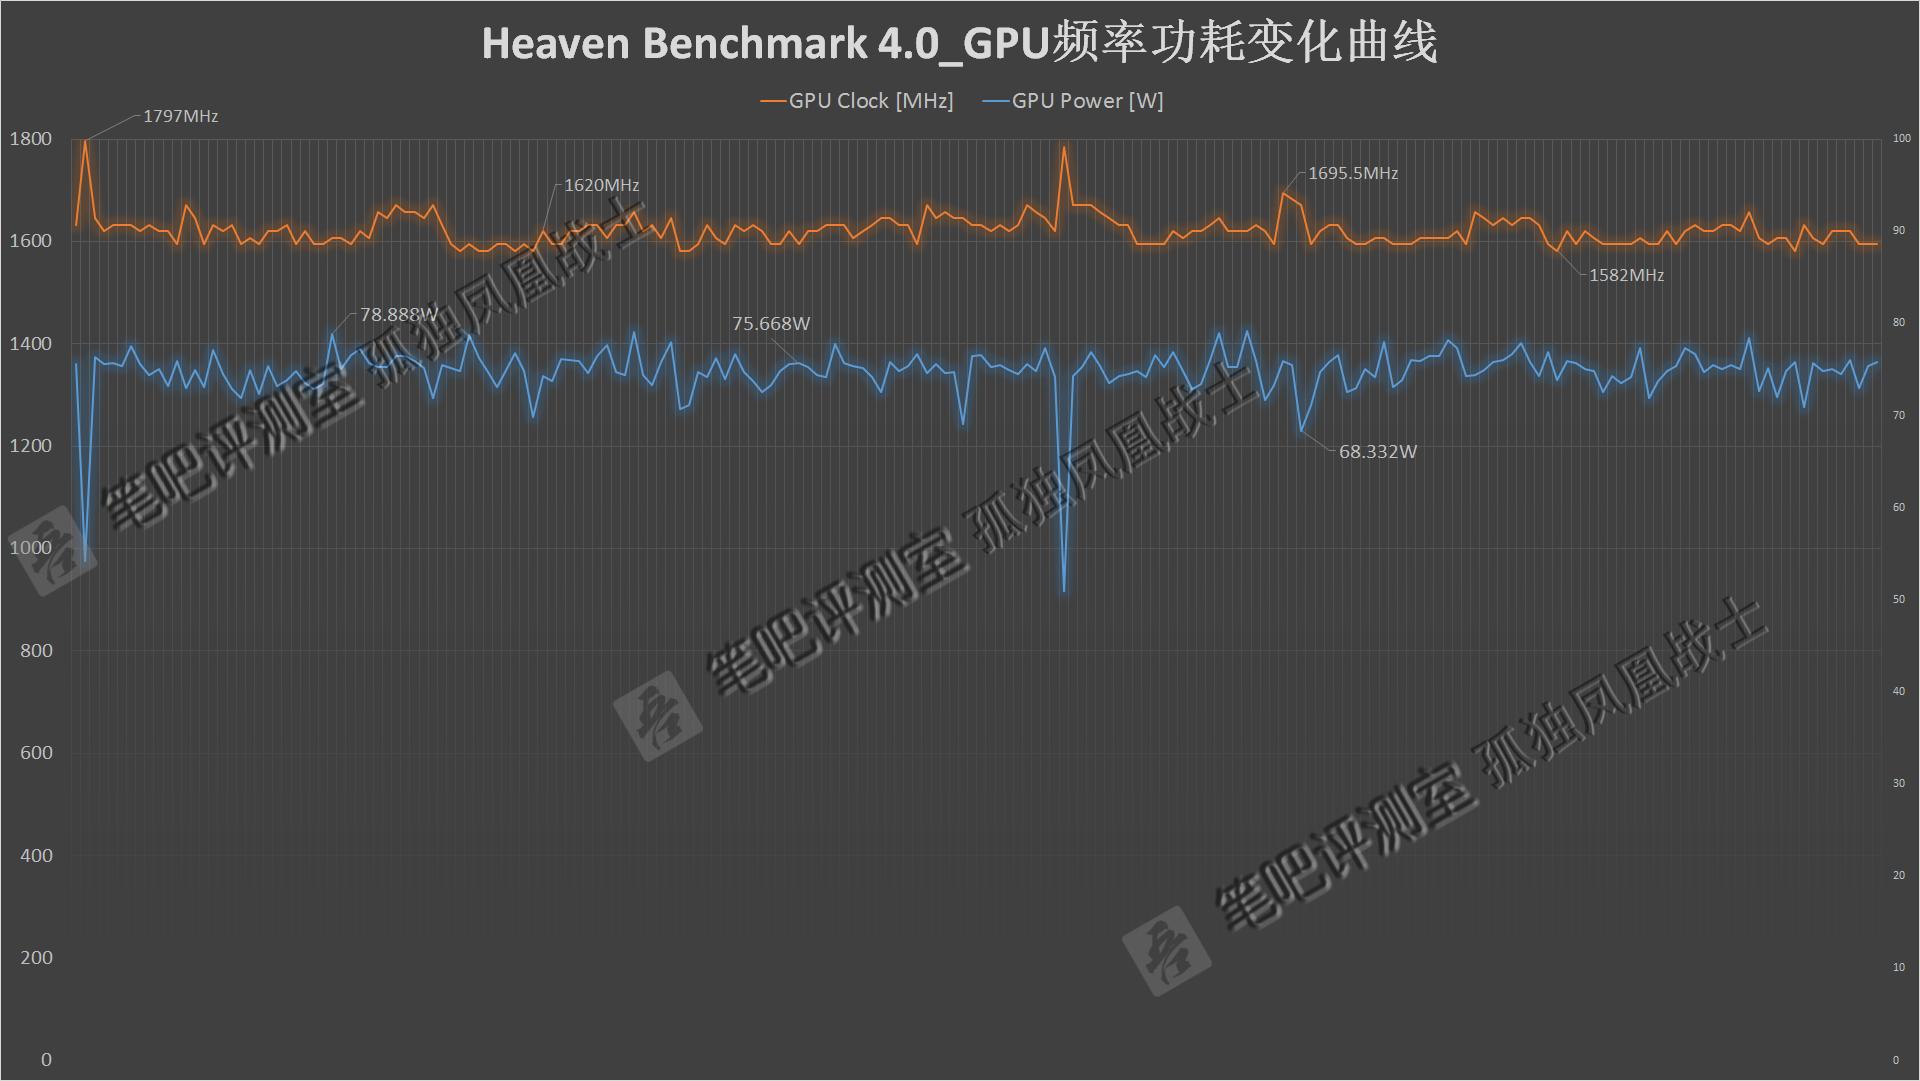 NVIDIA GeForce GTX 1060 Mobile (5)